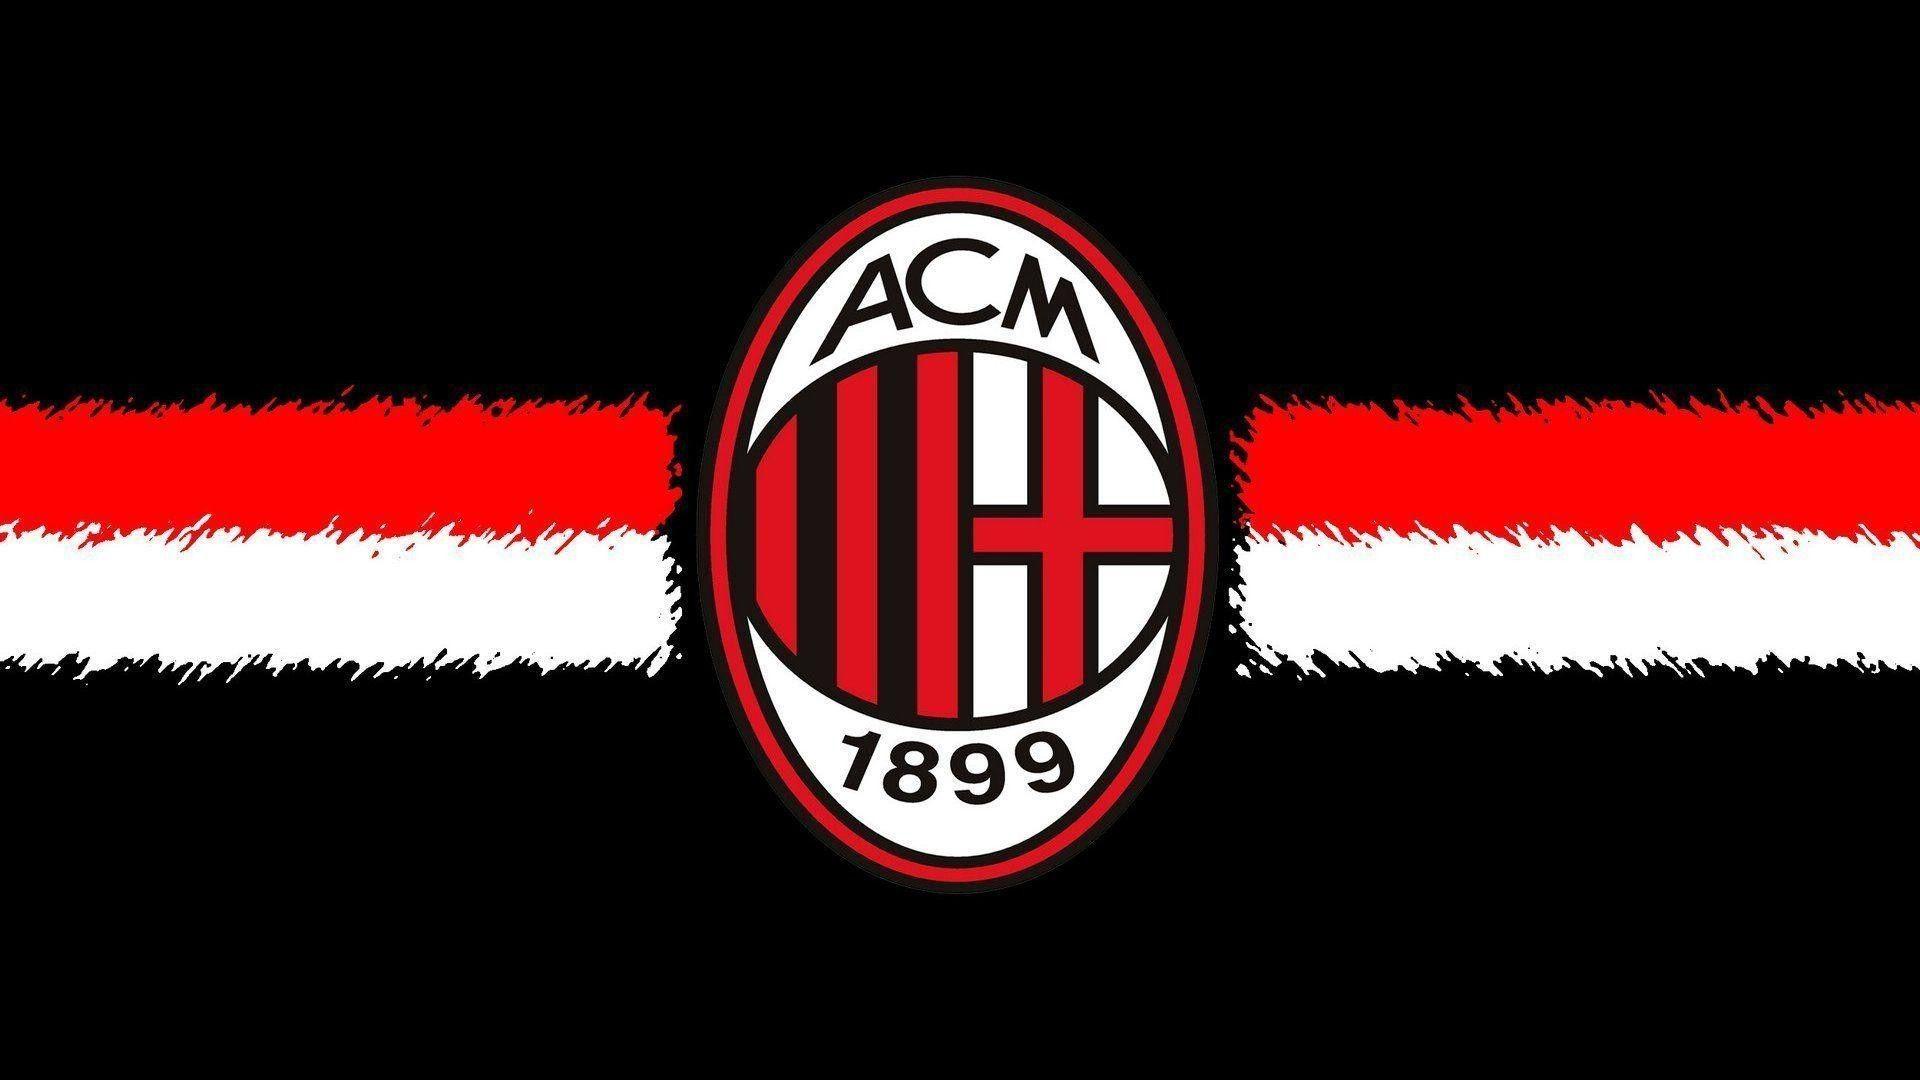 1920x1080 1920x1080 Ac Milan Black Adidas Uniform Hd Wallpaper